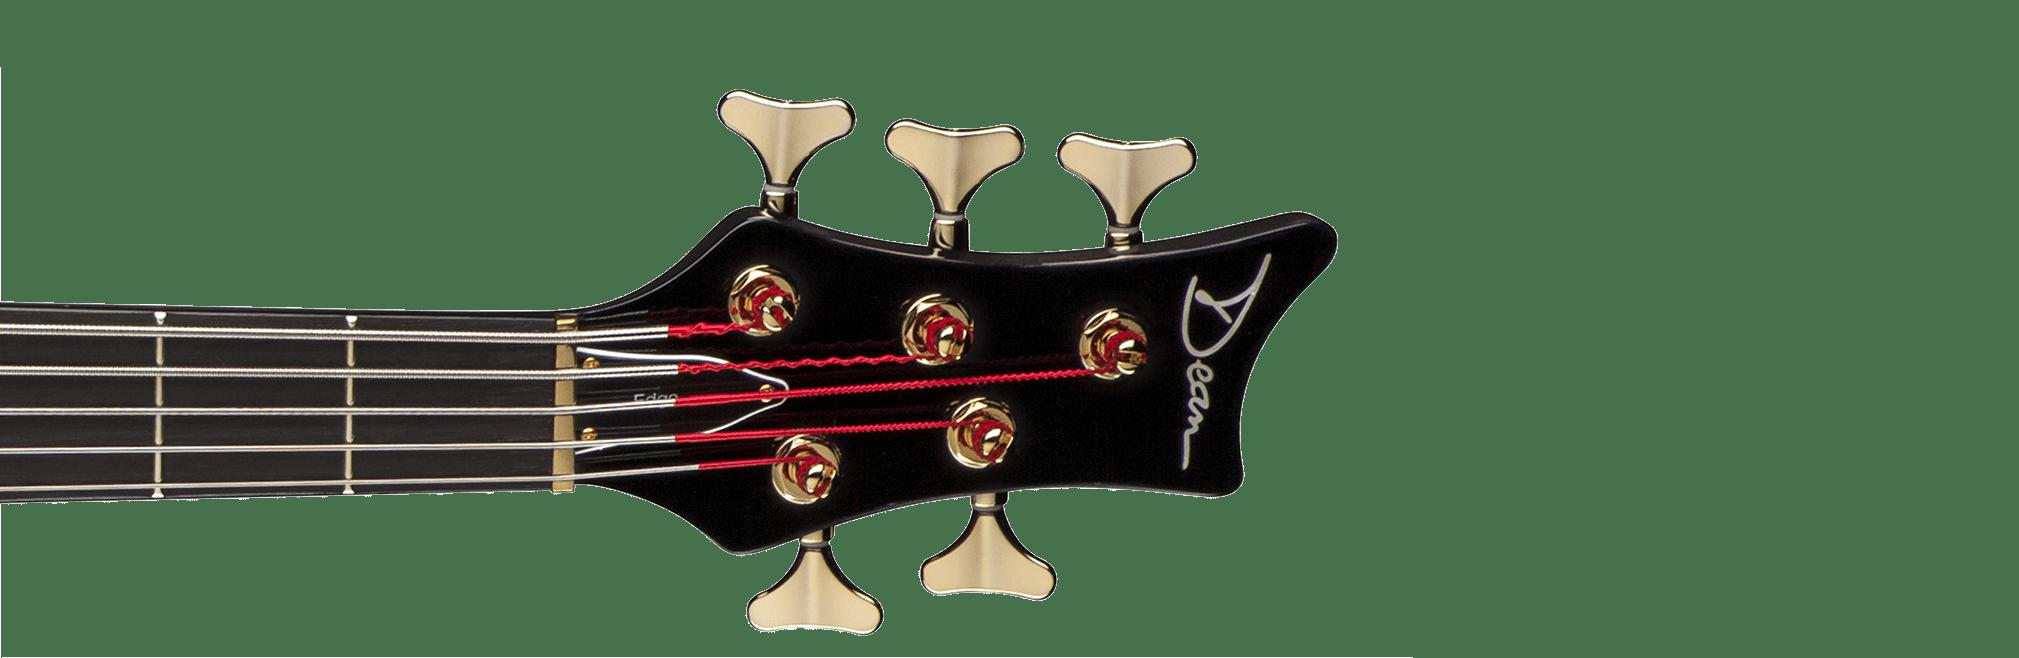 ... Dean Guitars Image ...